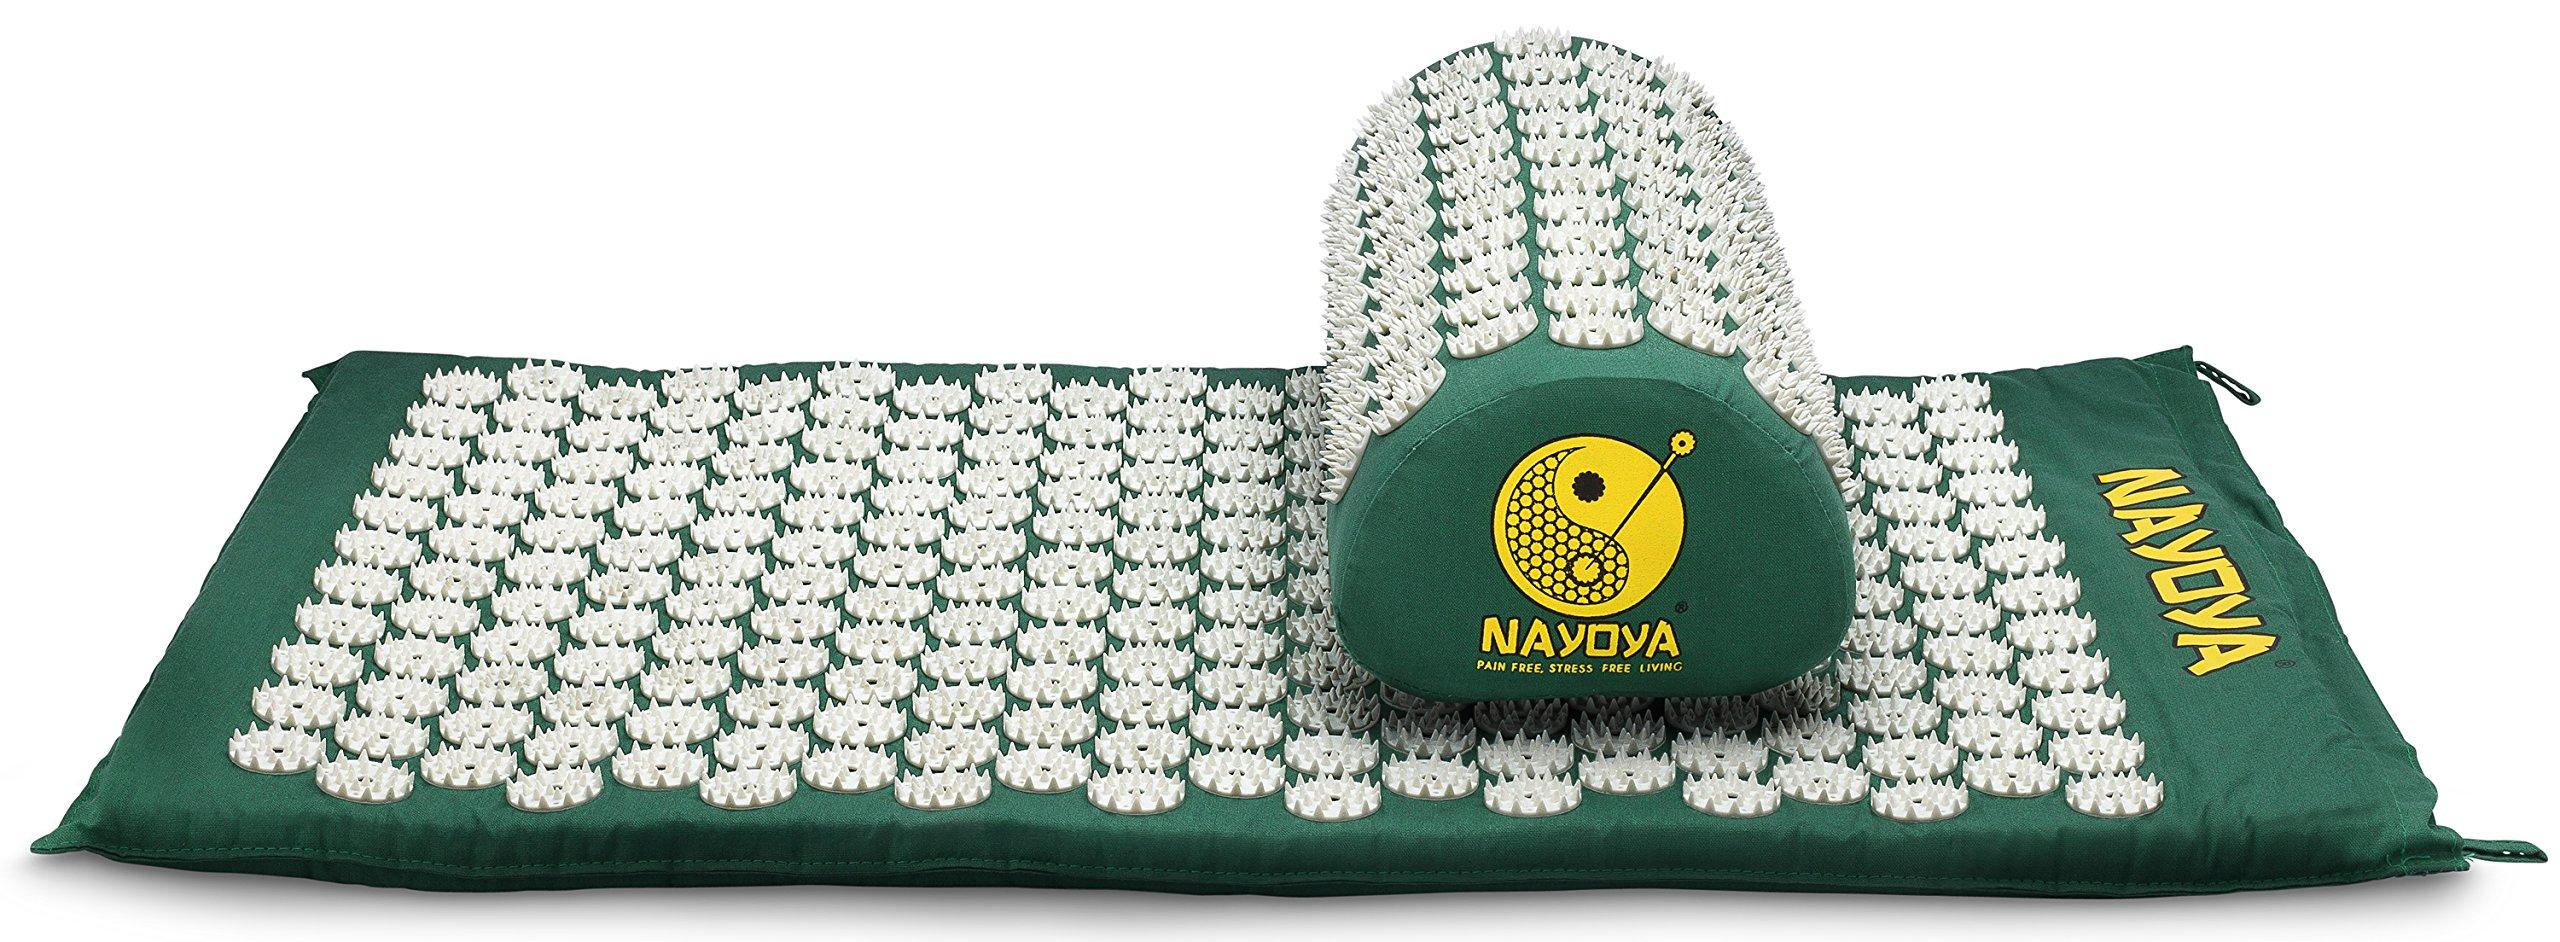 buy nayoya back and neck pain relief